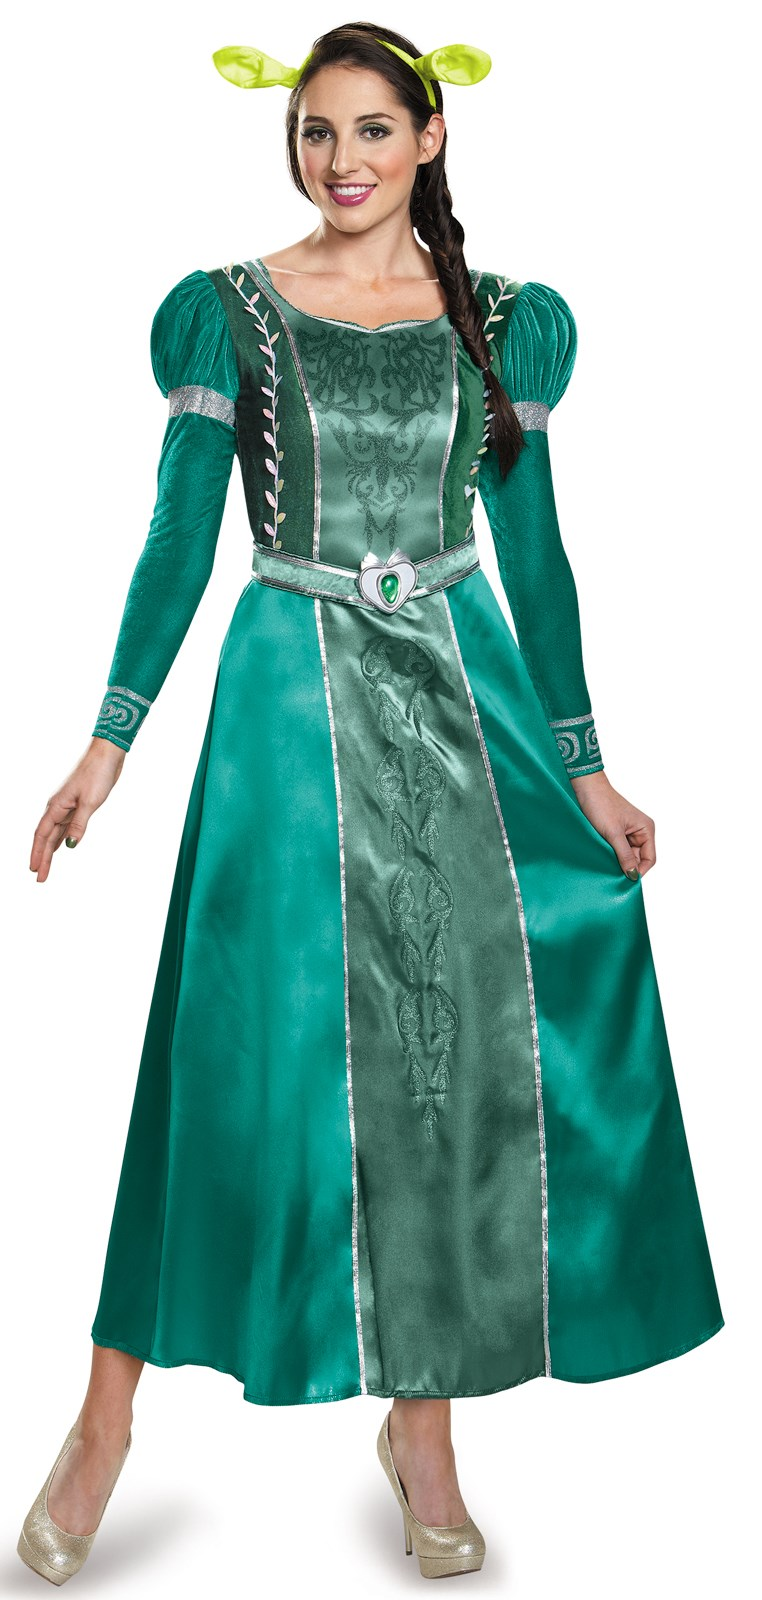 Shrek Deluxe Womens Princess Fiona Costume